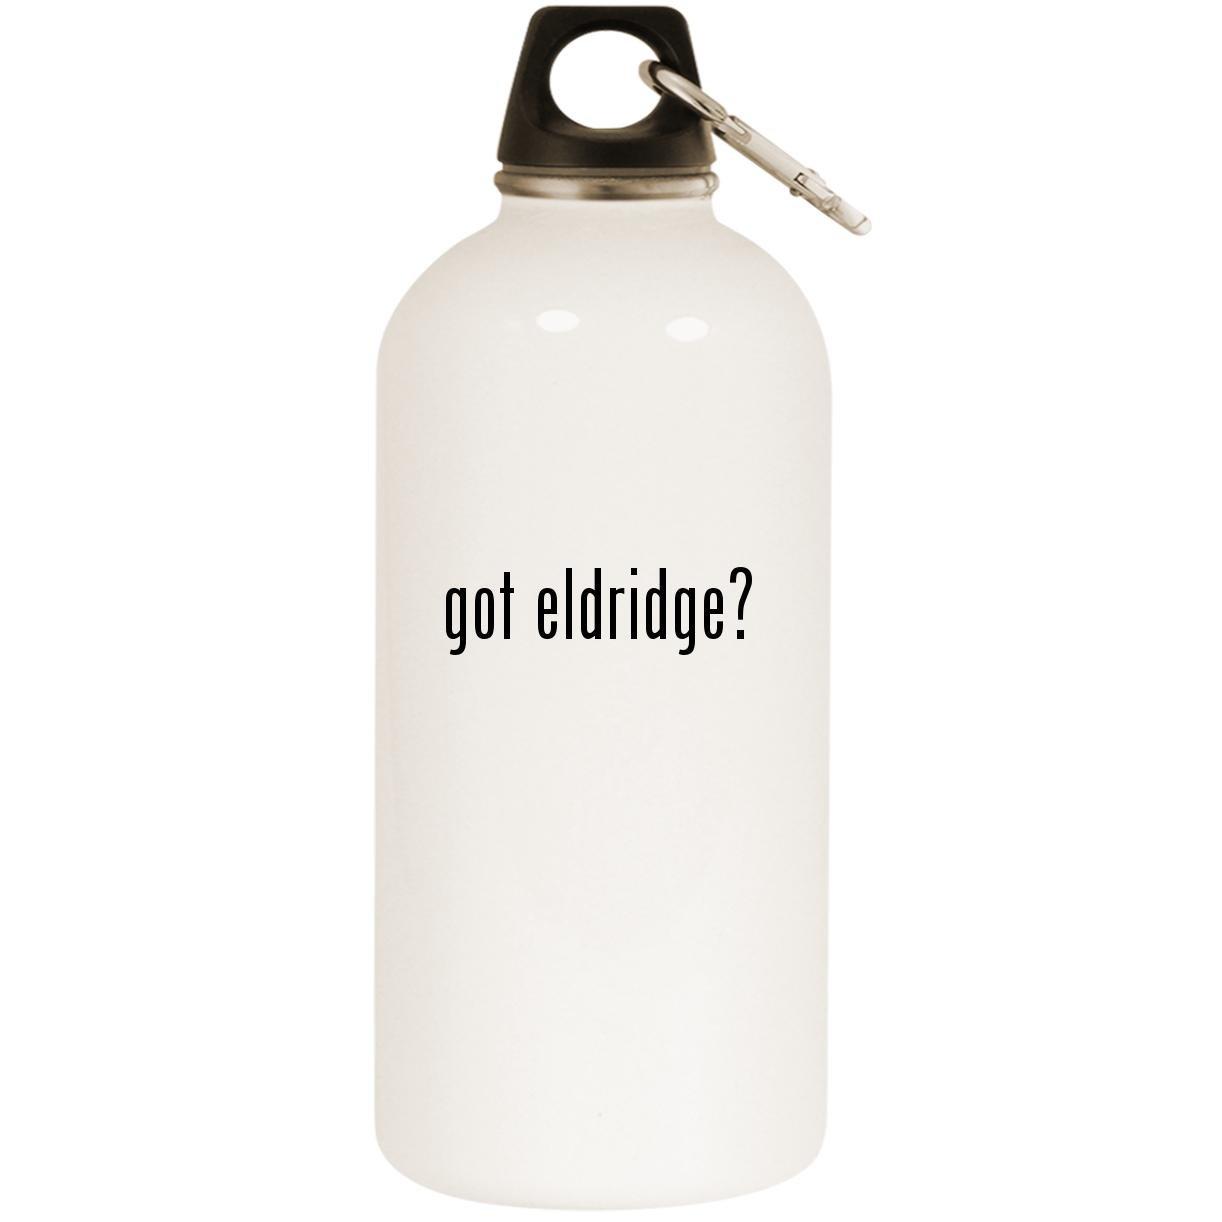 got eldridge? - White 20oz Stainless Steel Water Bottle with Carabiner